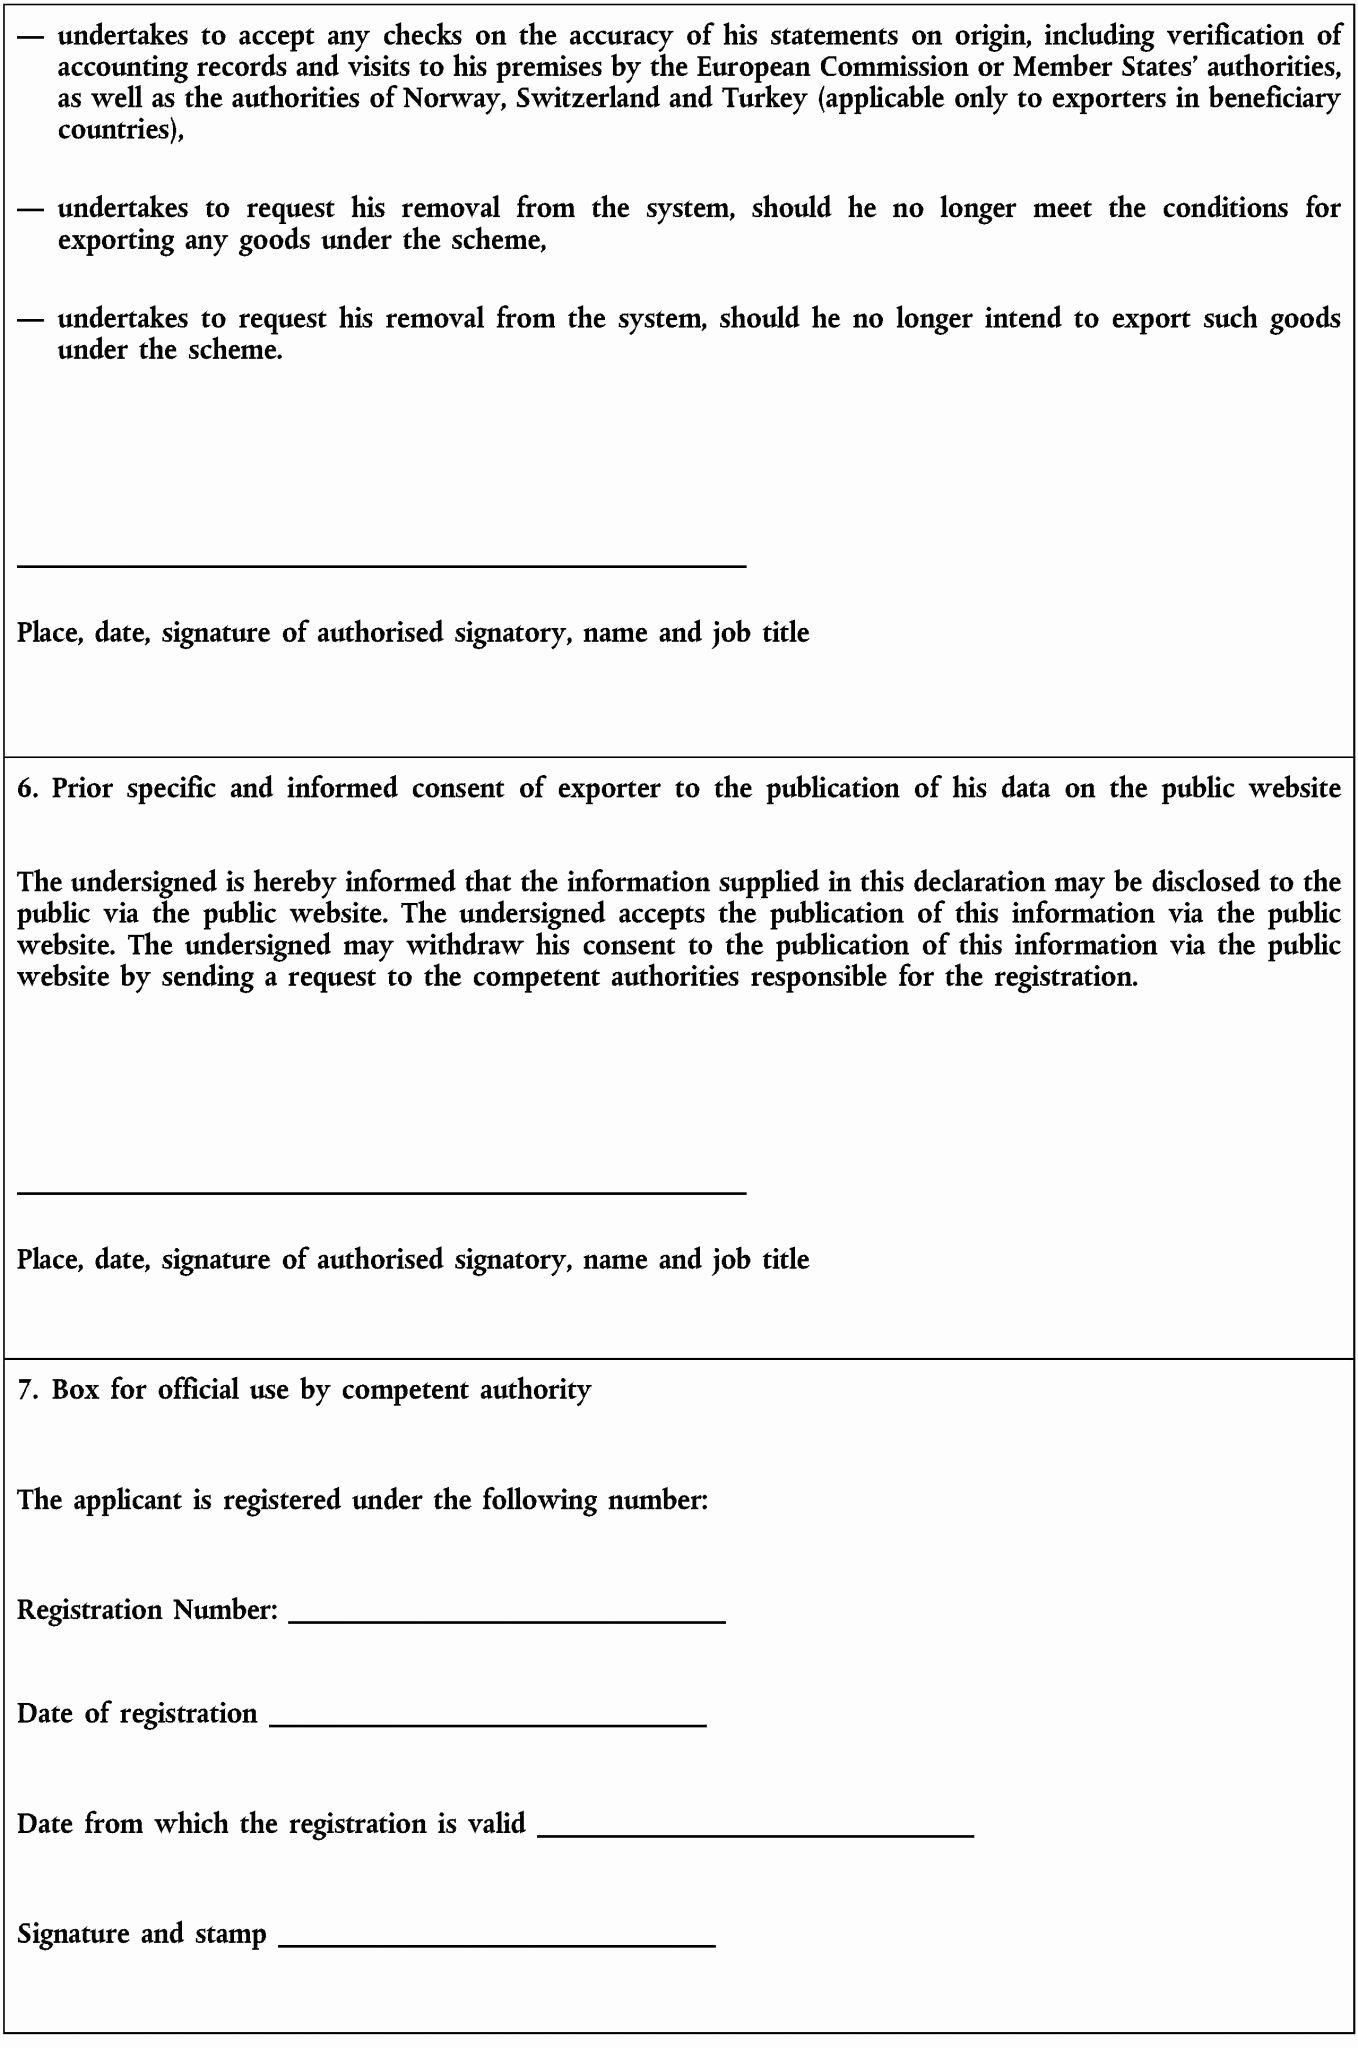 Checks and Balances Worksheet Answers Fresh Checks and Balances Worksheet Answers Promotiontablecovers